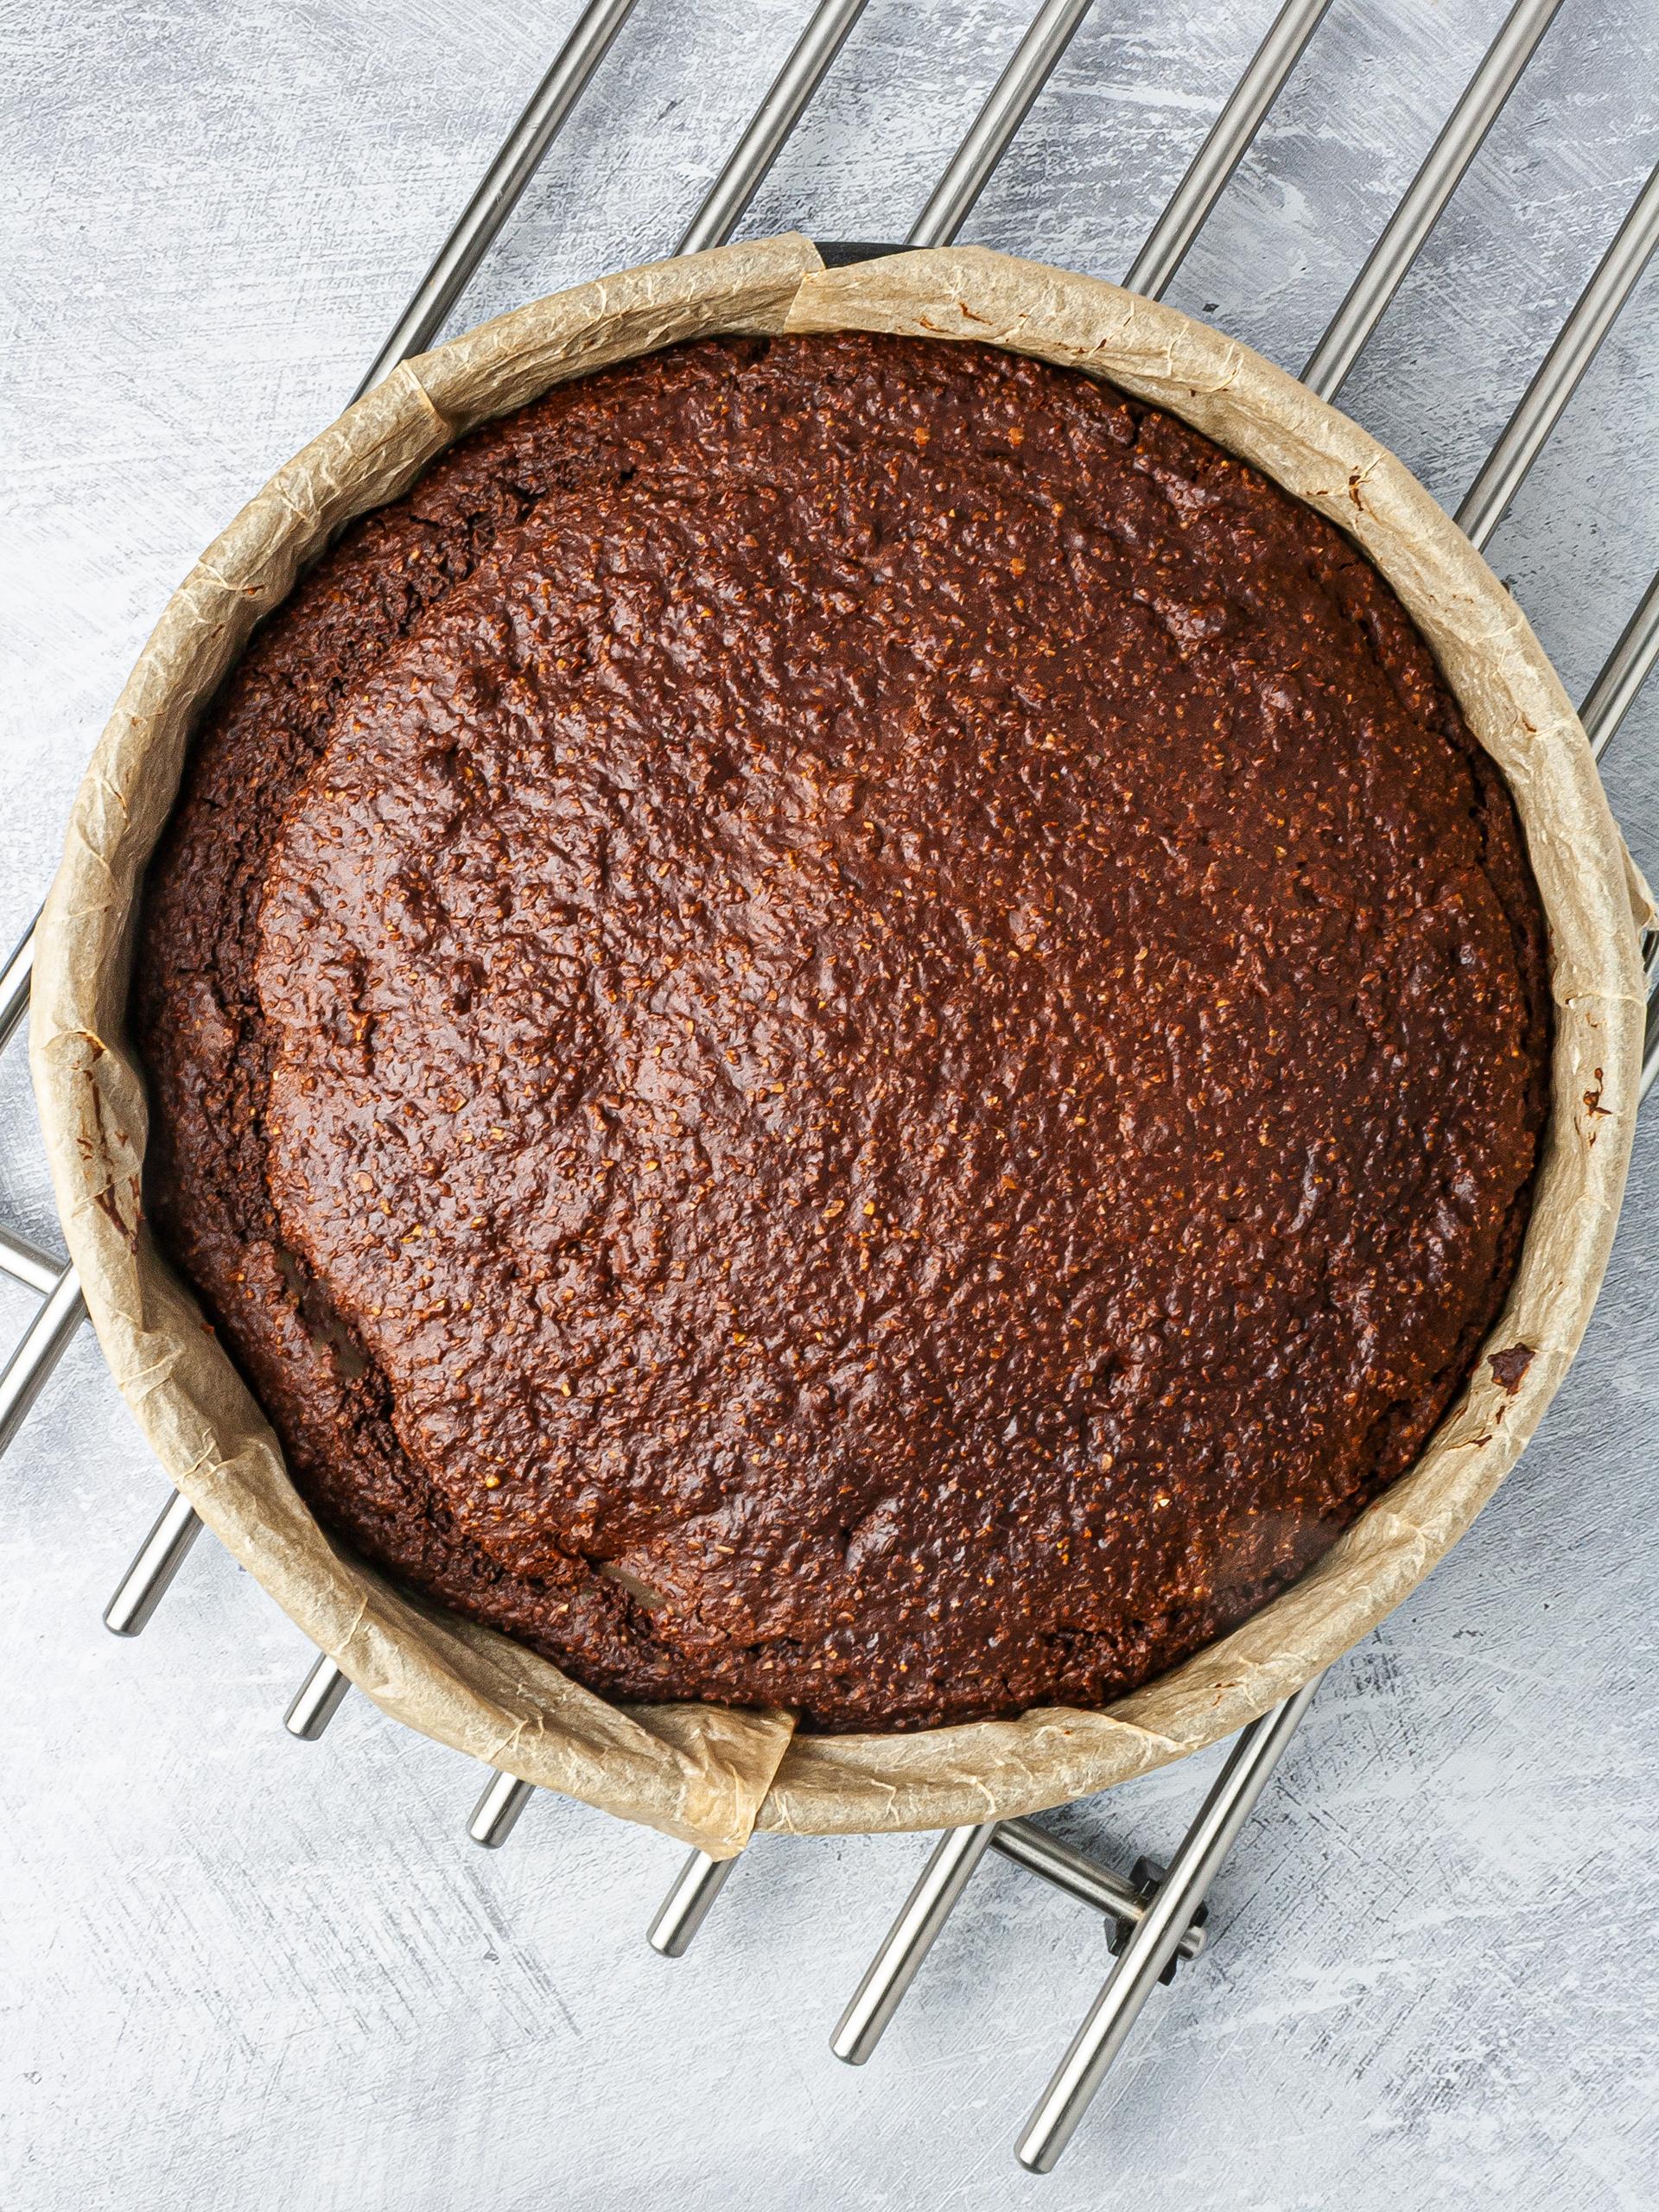 Chocolate lavender cake baked